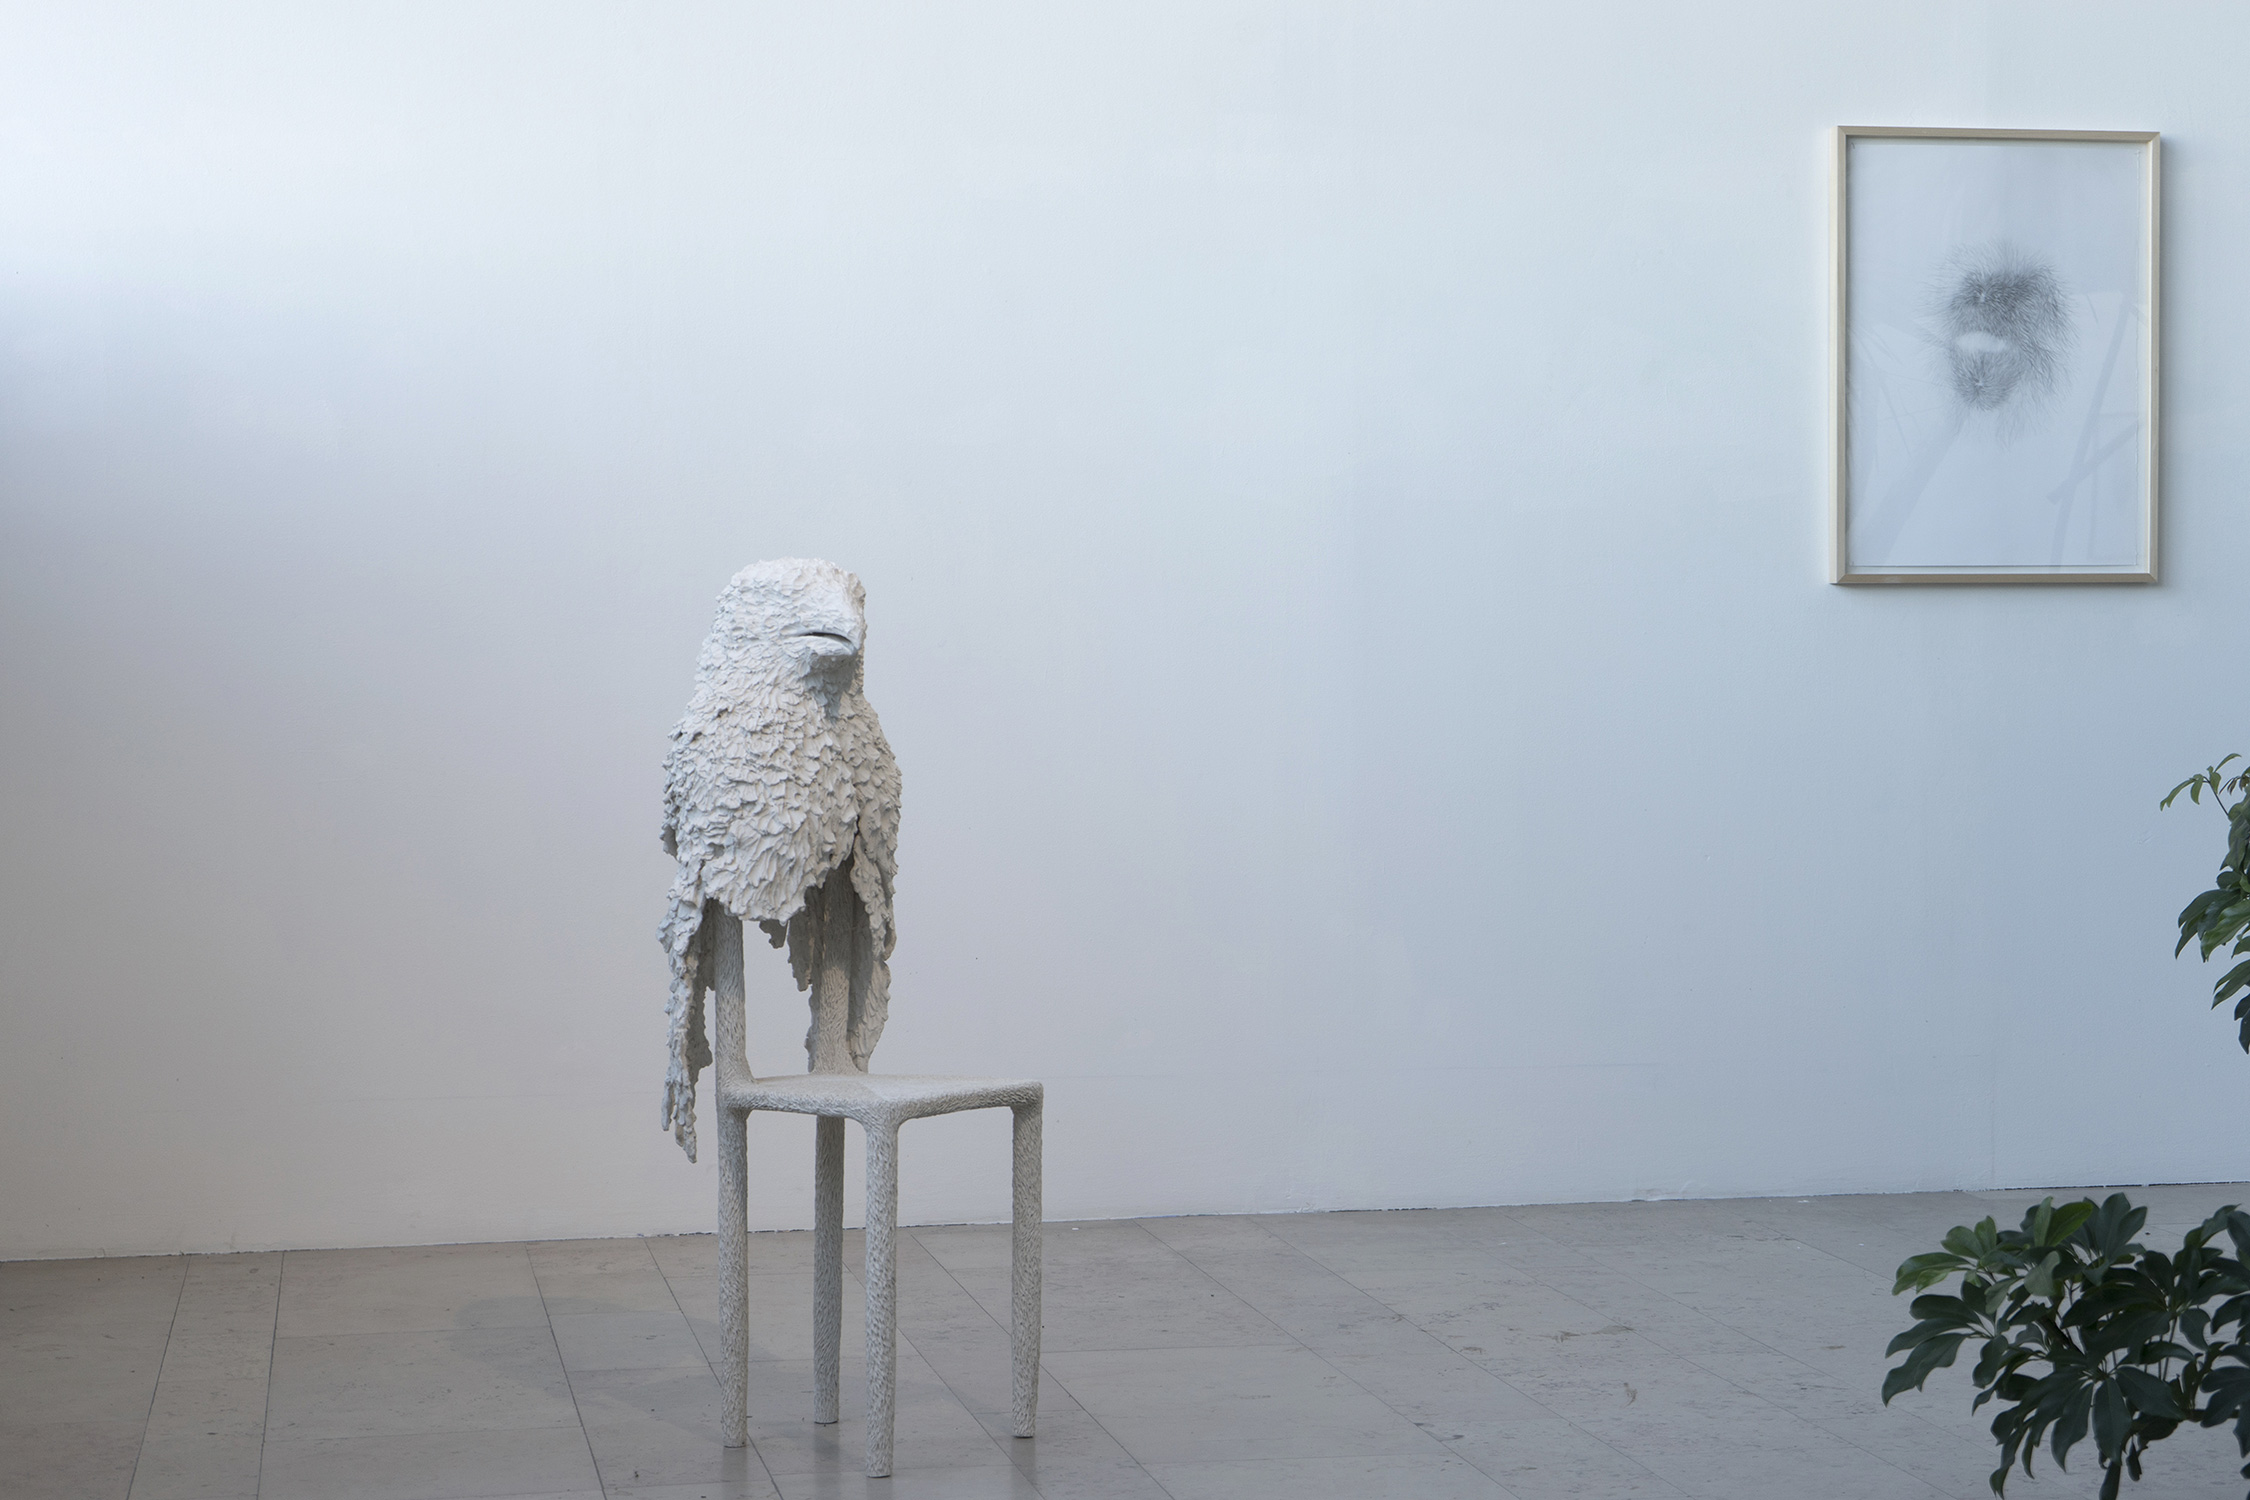 <i>l'hôte</i>, 2018, sculpture, terre cuite blanche, 112x40x35 cm